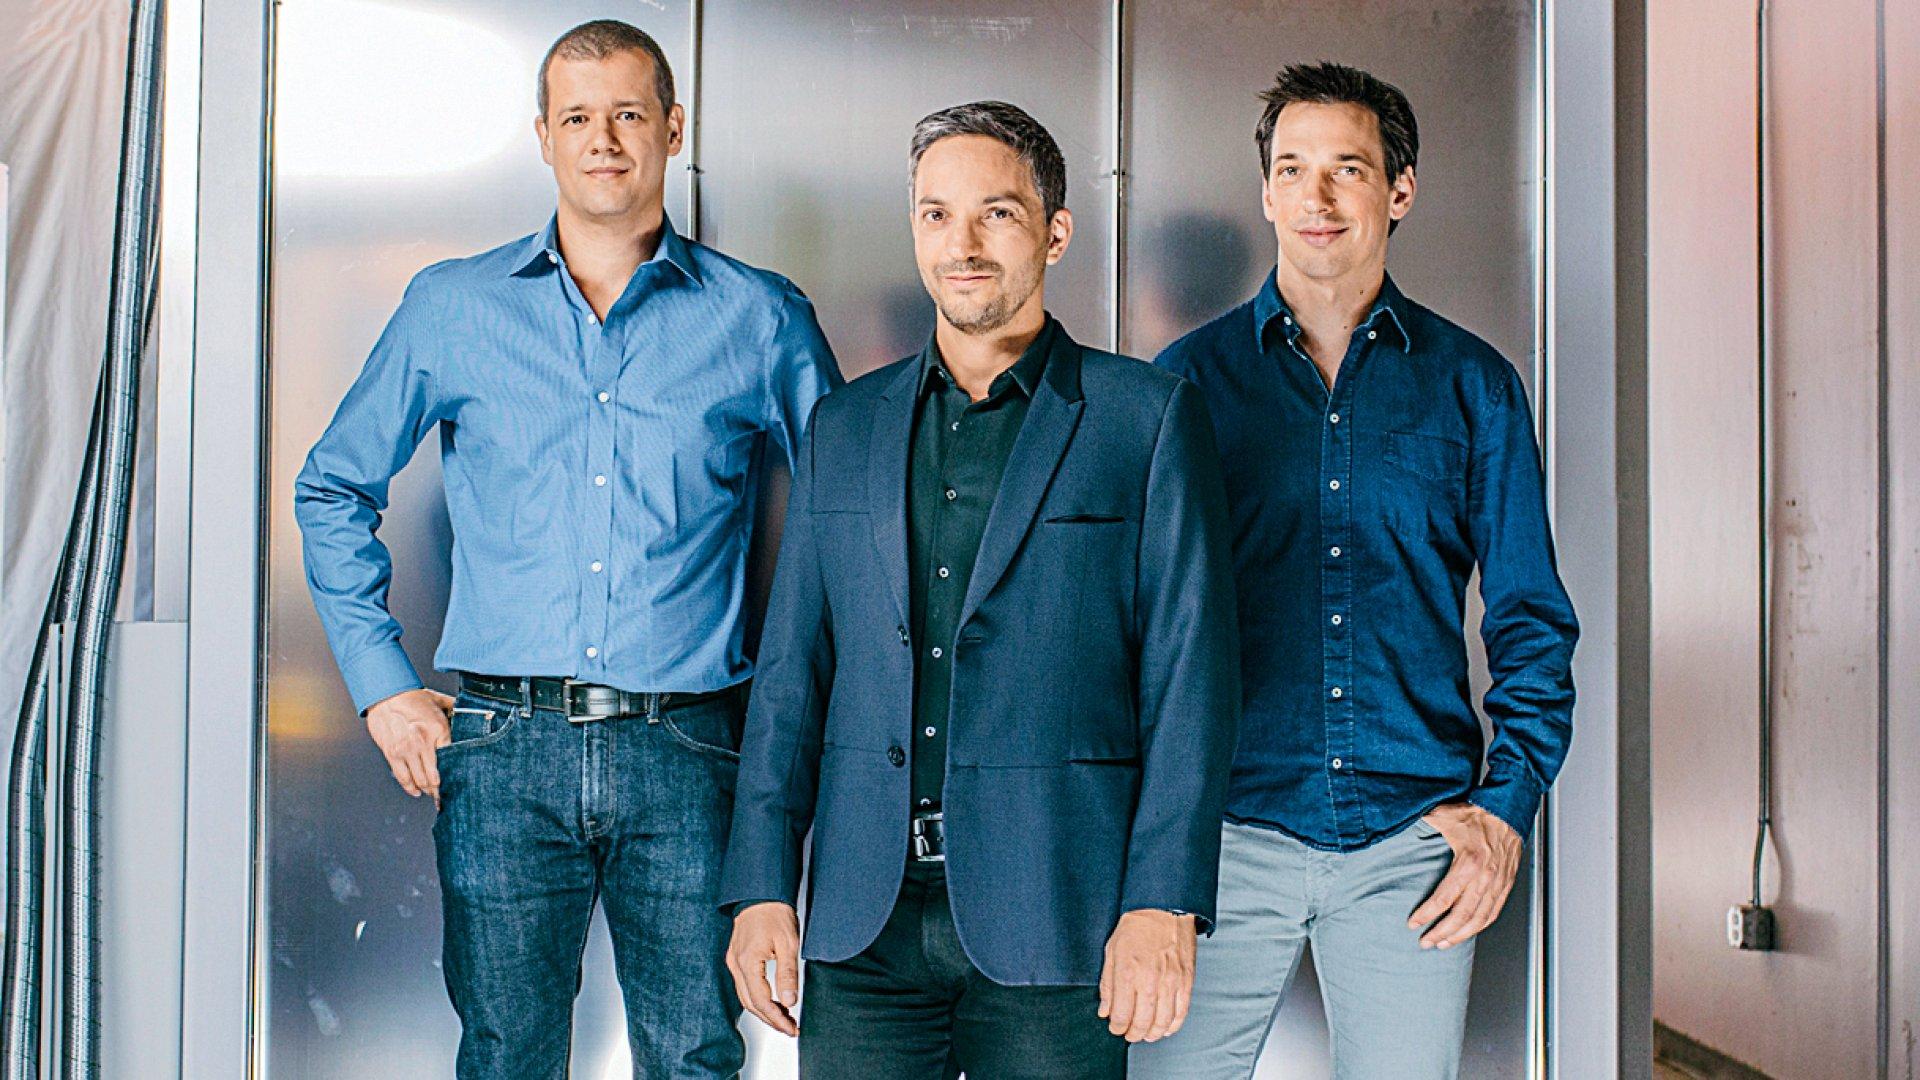 Sila Nanotechnologies founders (from left) Gene Berdichevsky, Gleb Yushin, and Alex Jacobs at the company's Alameda, California, headquarters.